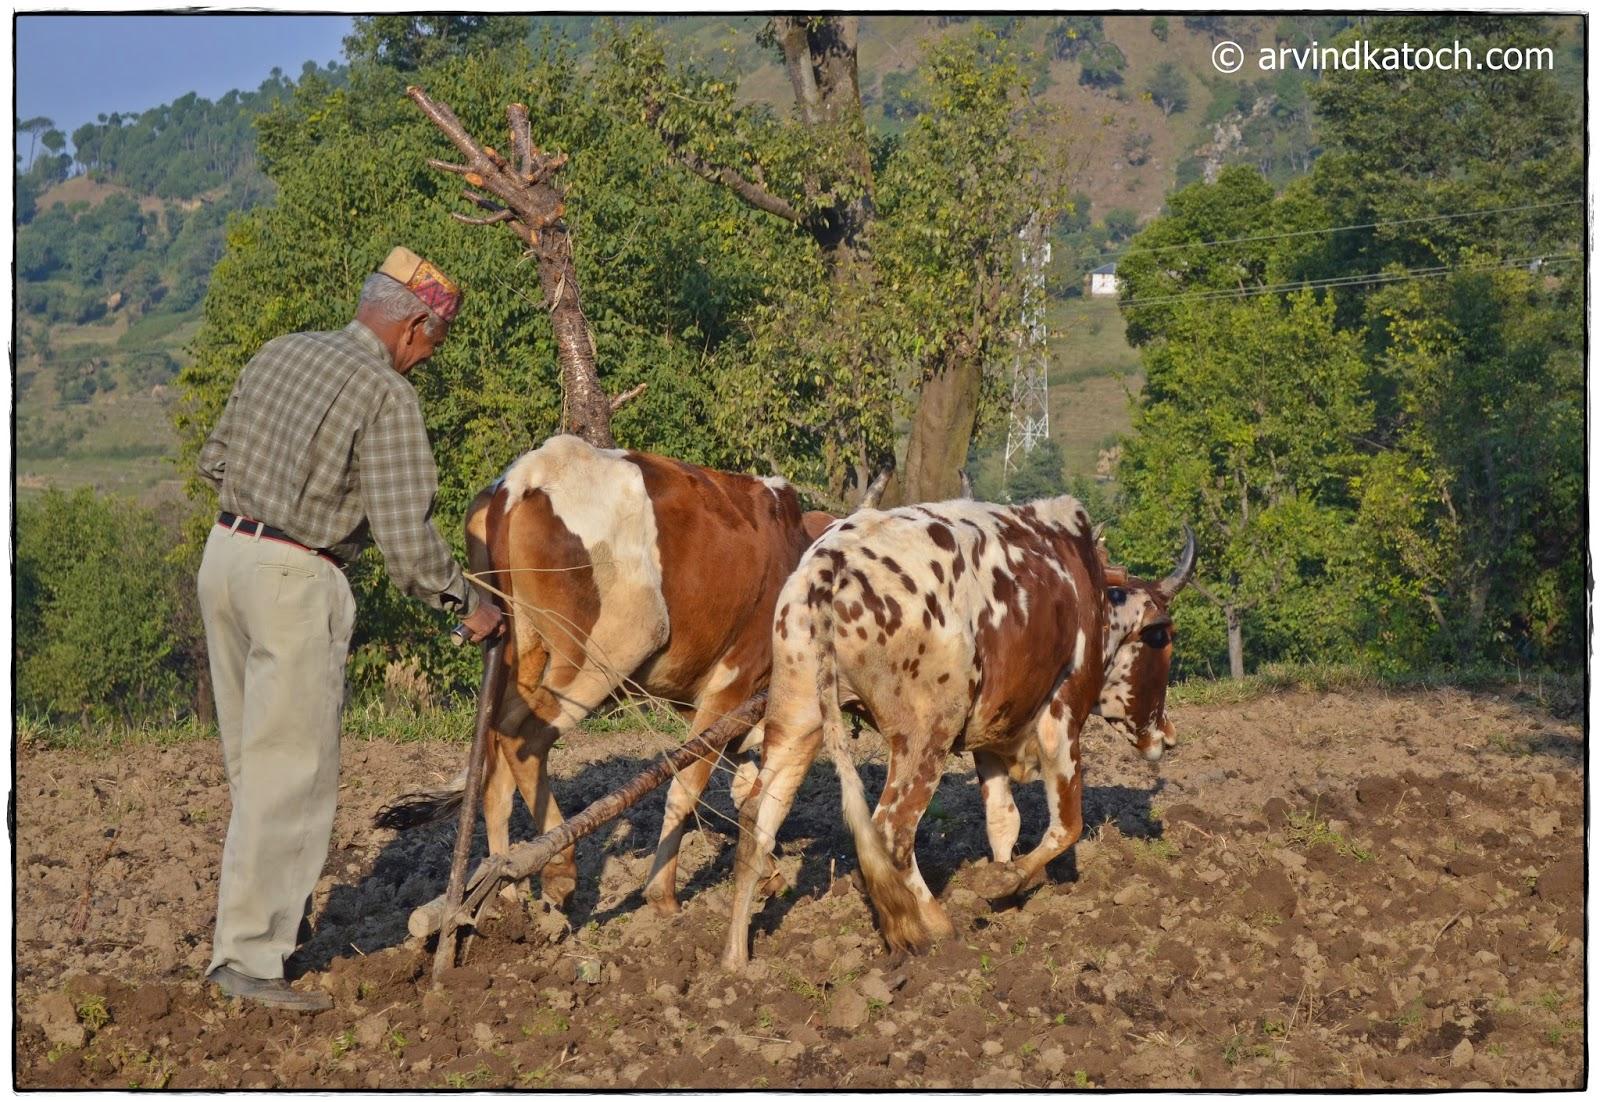 Indian Farmers, Poor Condition, Suicide,